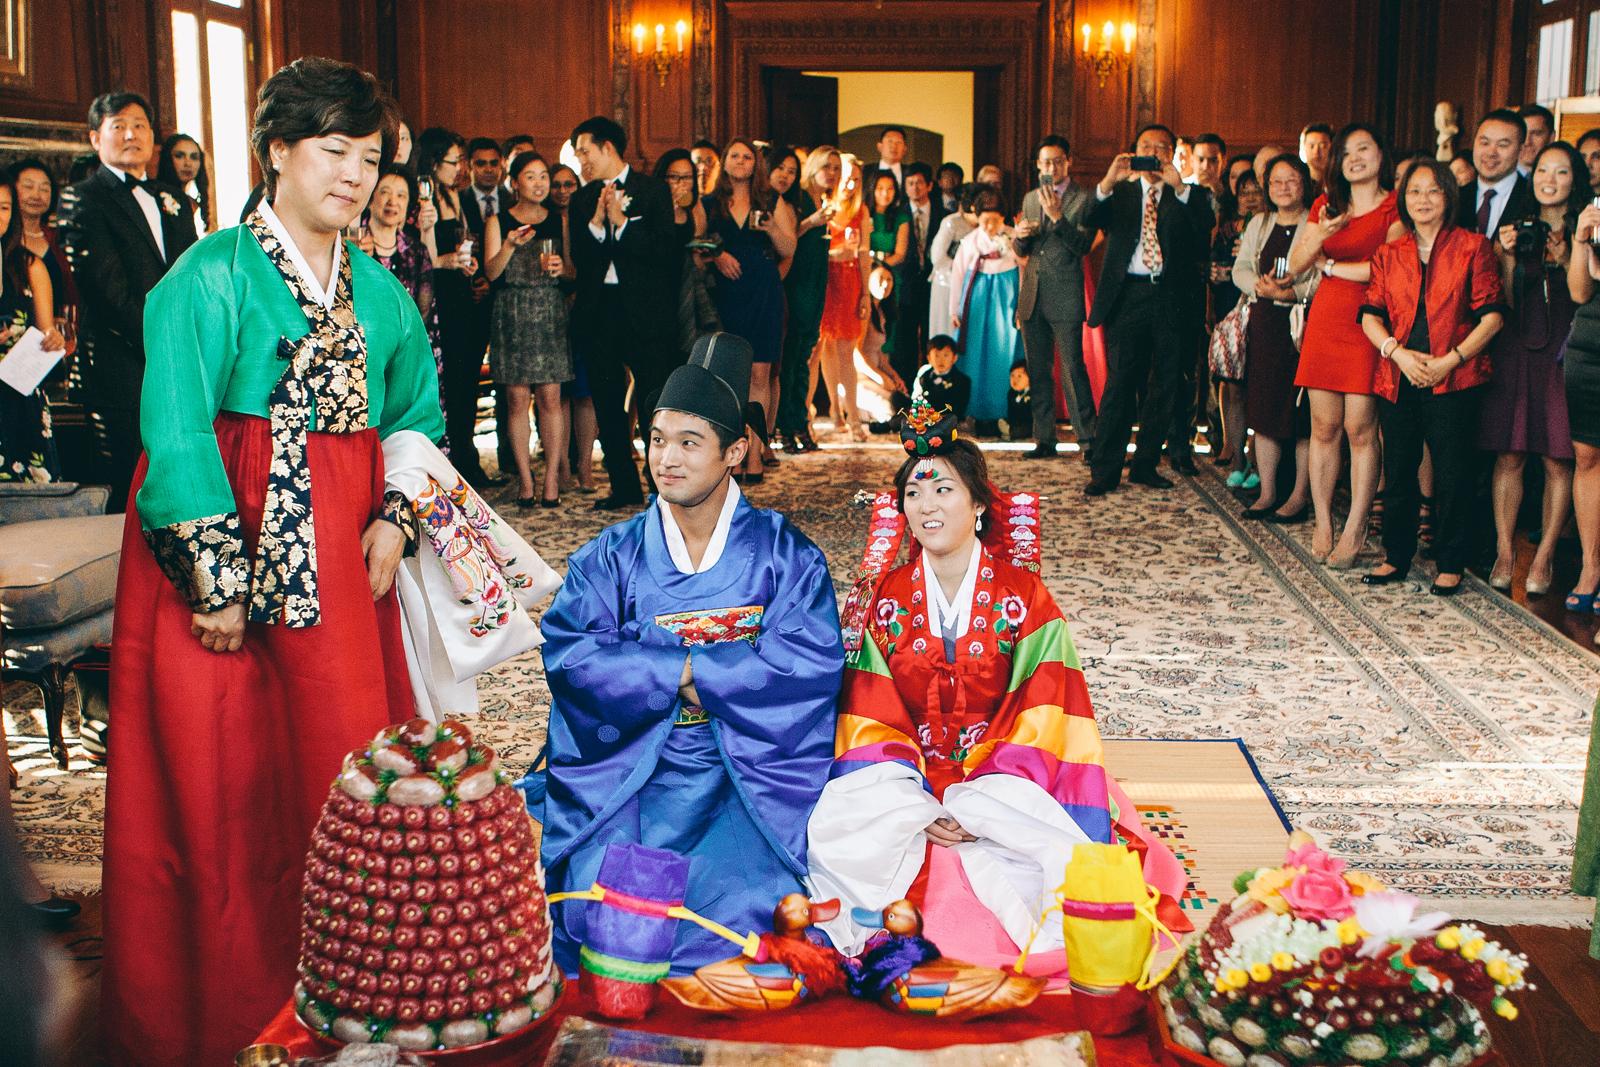 kohl_manison_wedding_photography_sarah_eric_ebony_siovhan_bokeh_photography_061.jpg